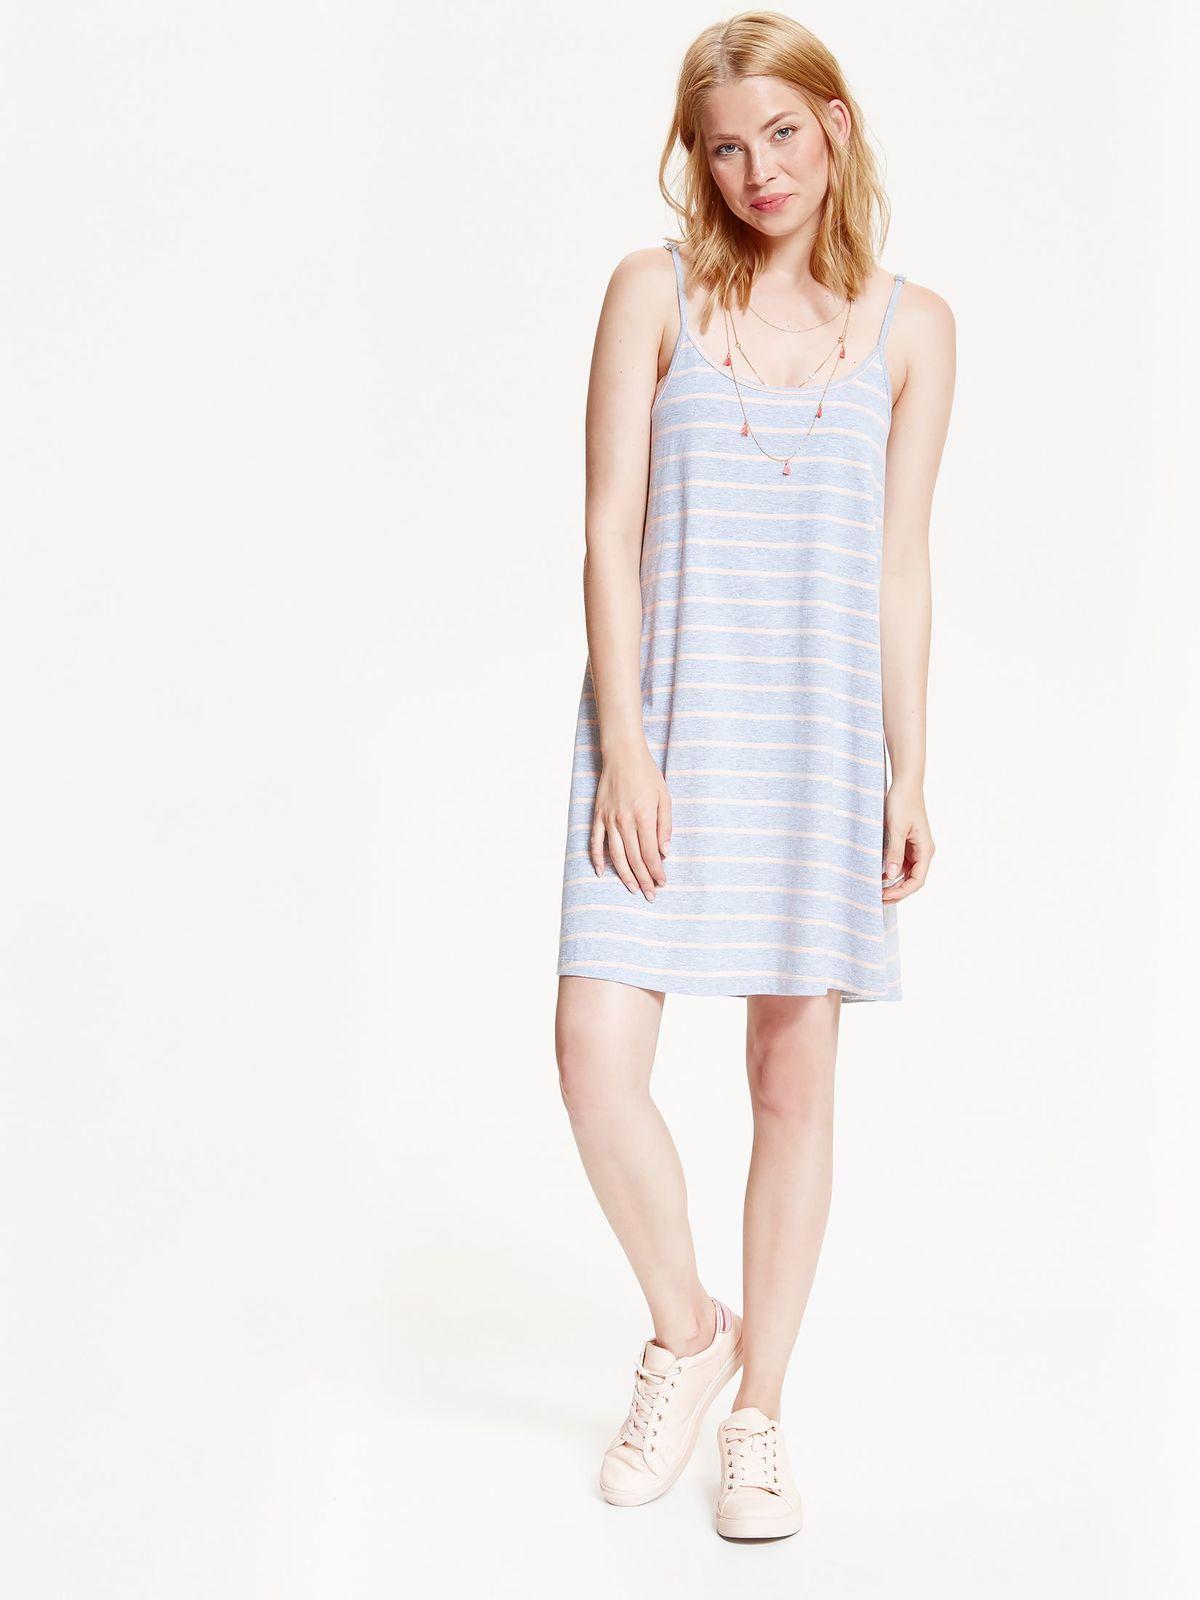 drywash γυναικειο φορεμα με ριγα - 159798